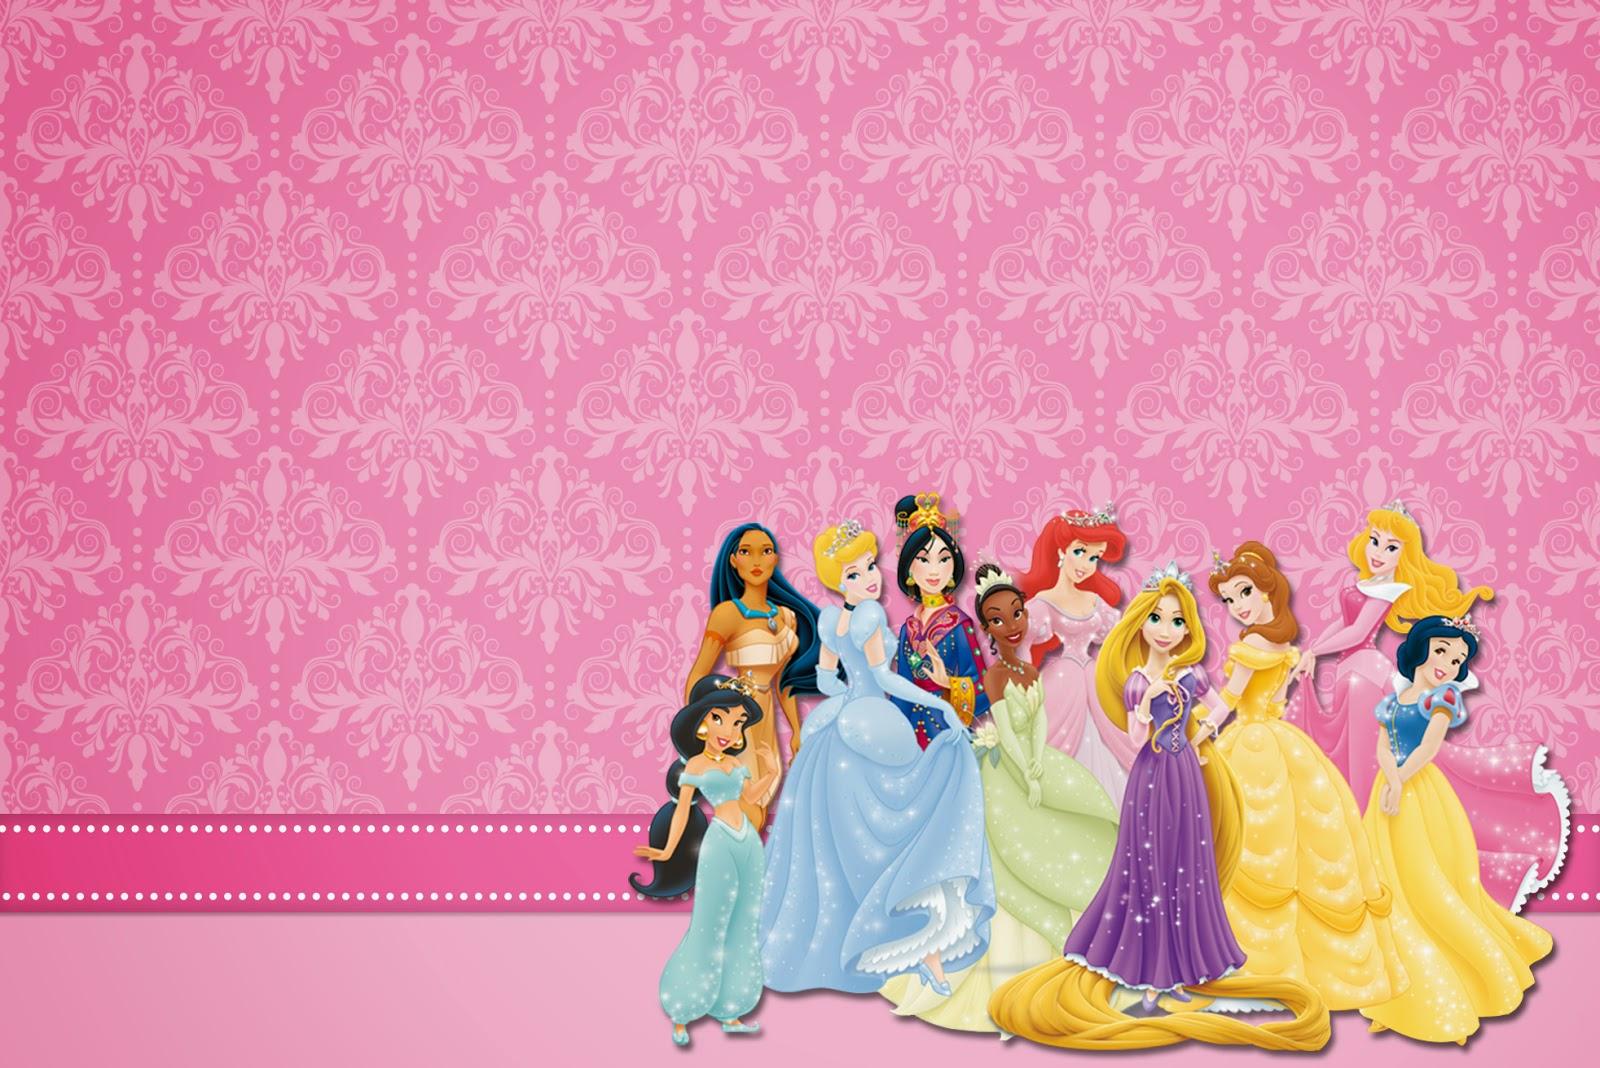 Disney Princess Party: Free Printable Party Invitations. | Oh My - Free Princess Printable Invitations